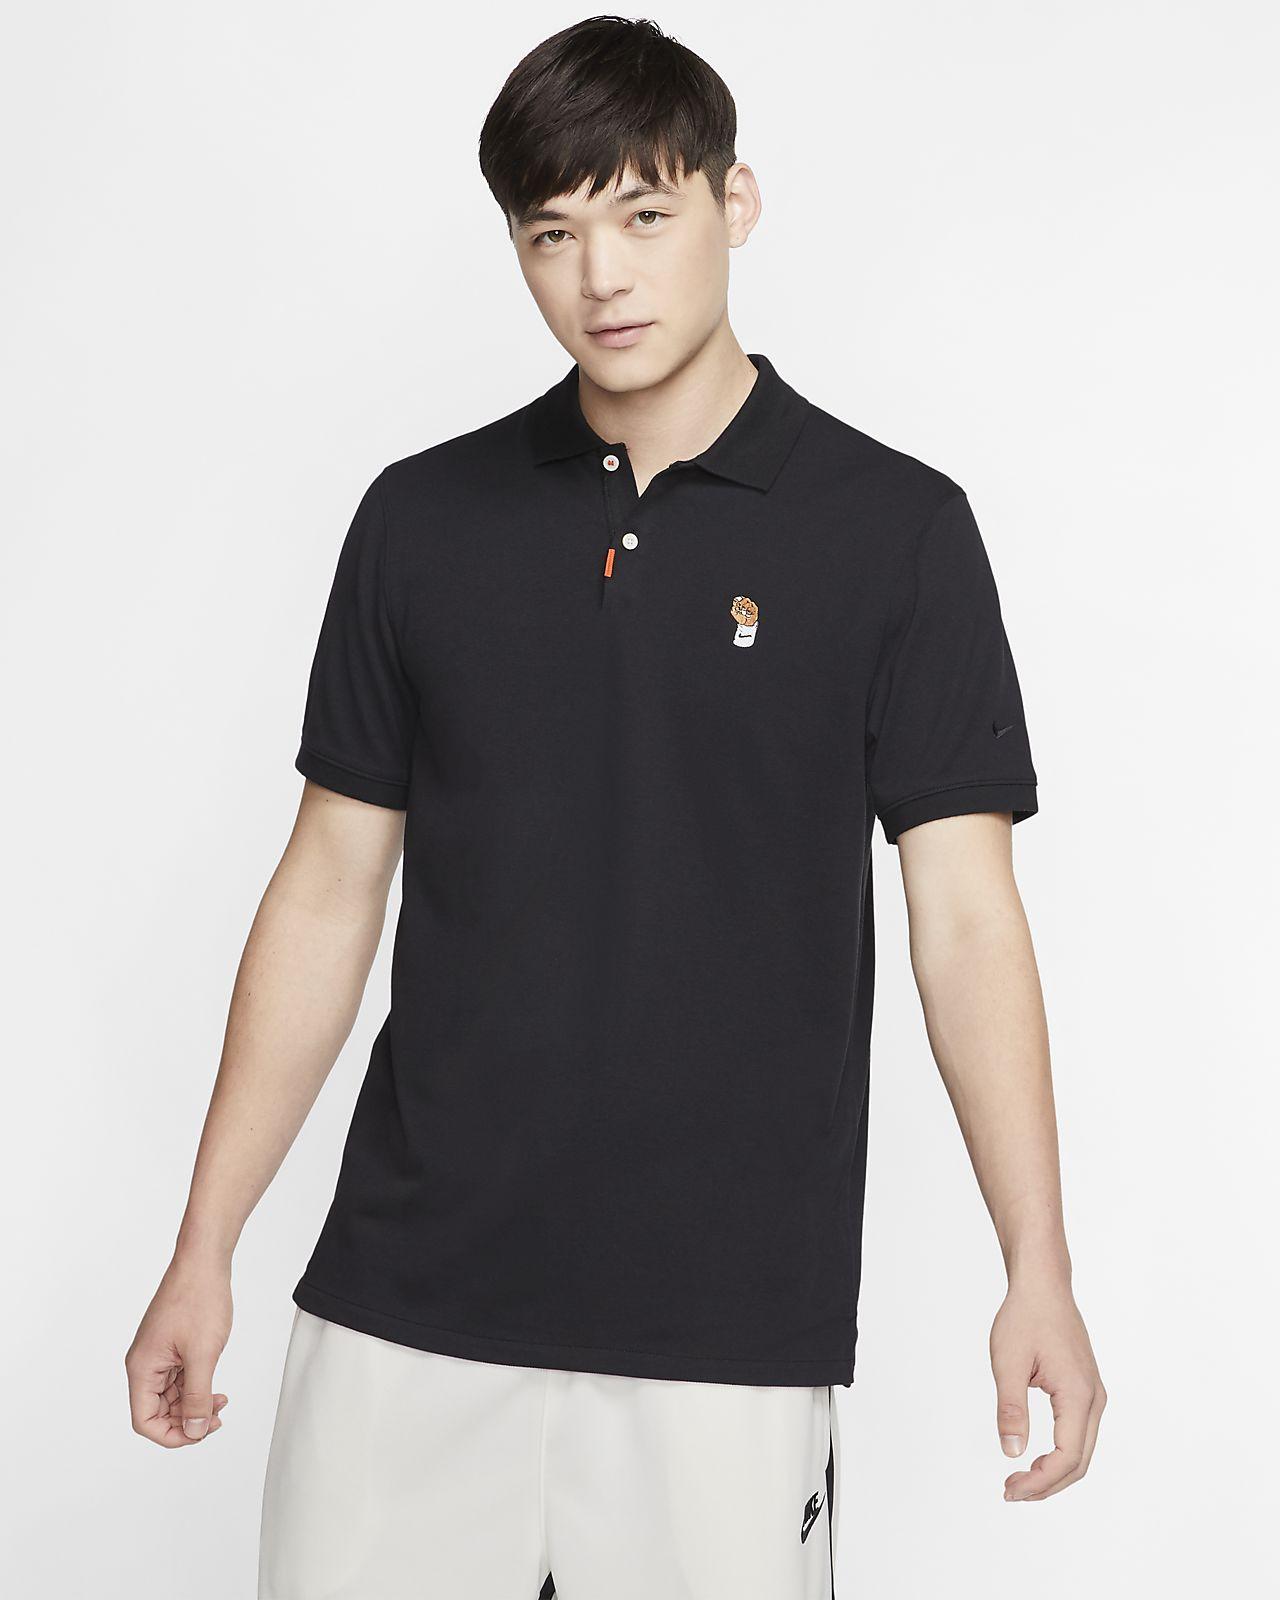 The Nike Polo ¡Vamos Rafa! Рубашка-поло унисекс с плотной посадкой